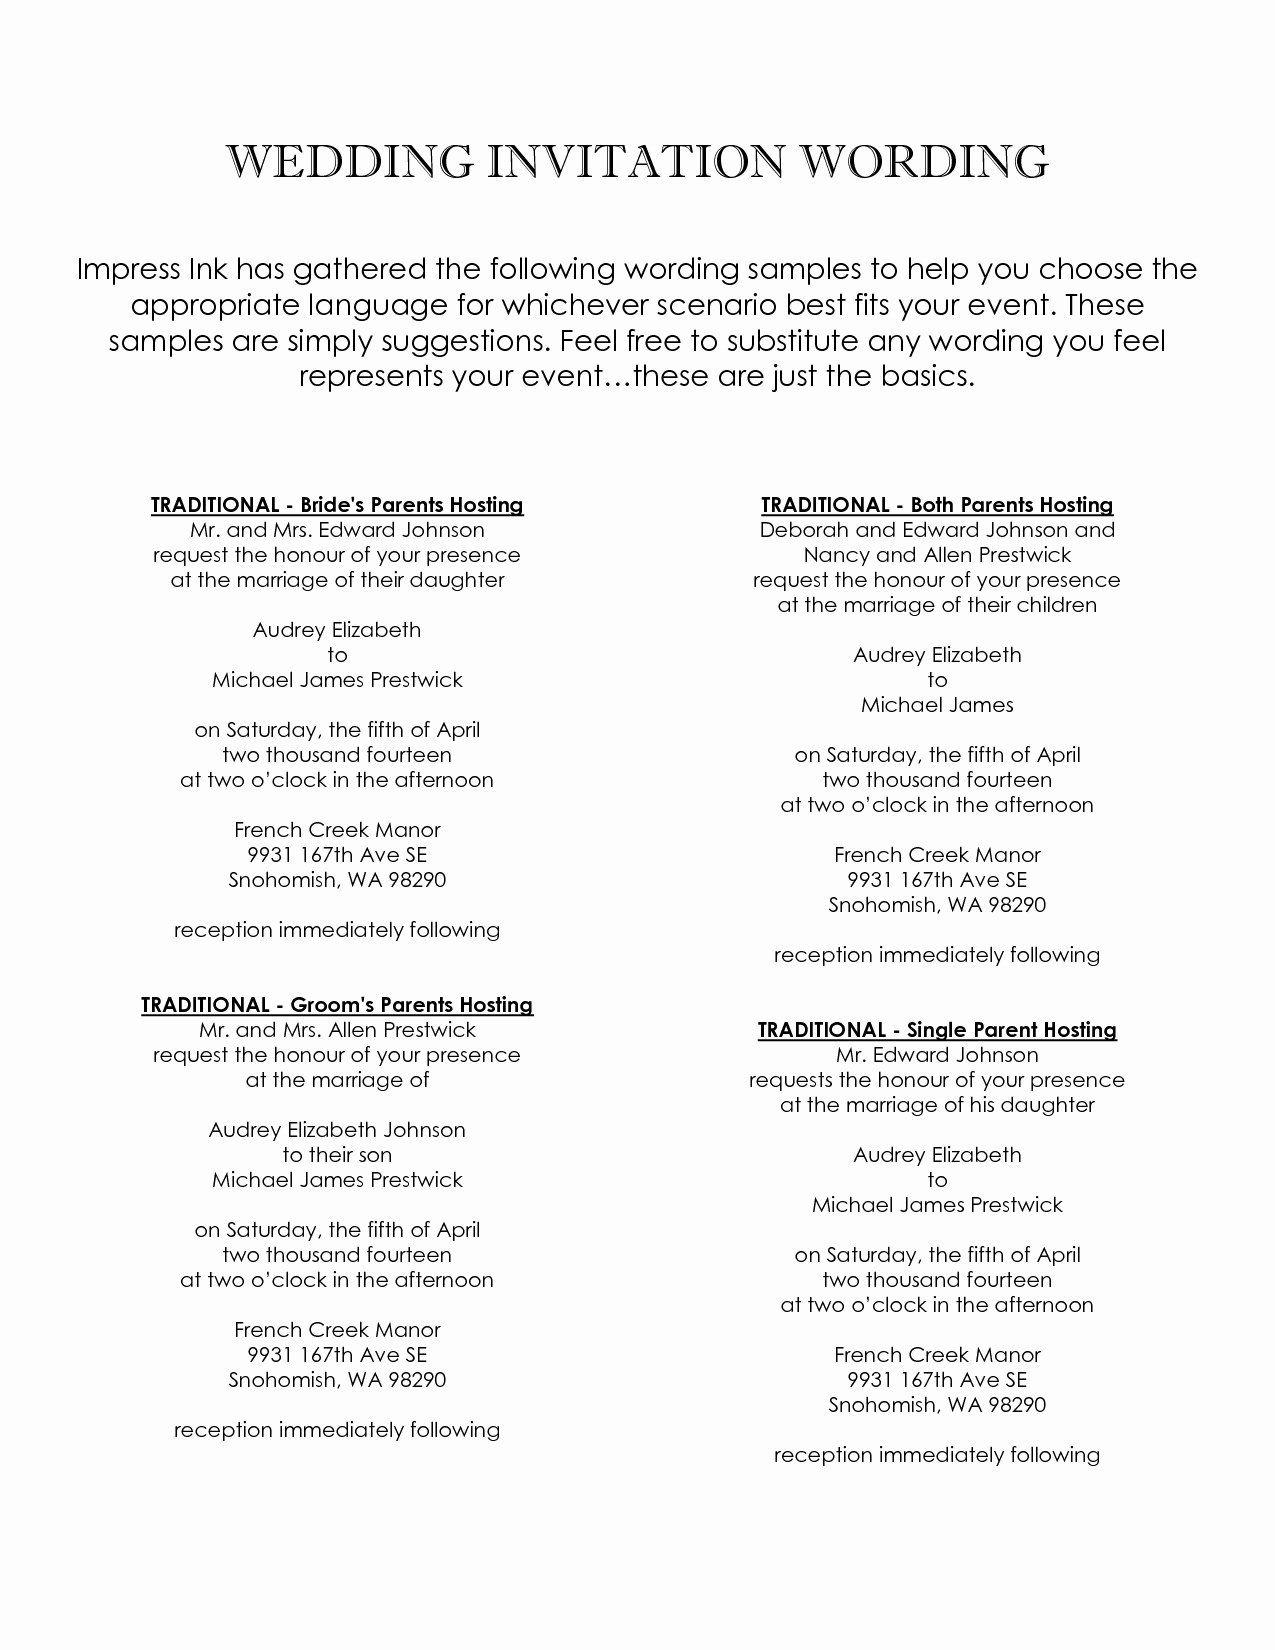 24 Couple Hosting Wedding Invitation Wording in 2020